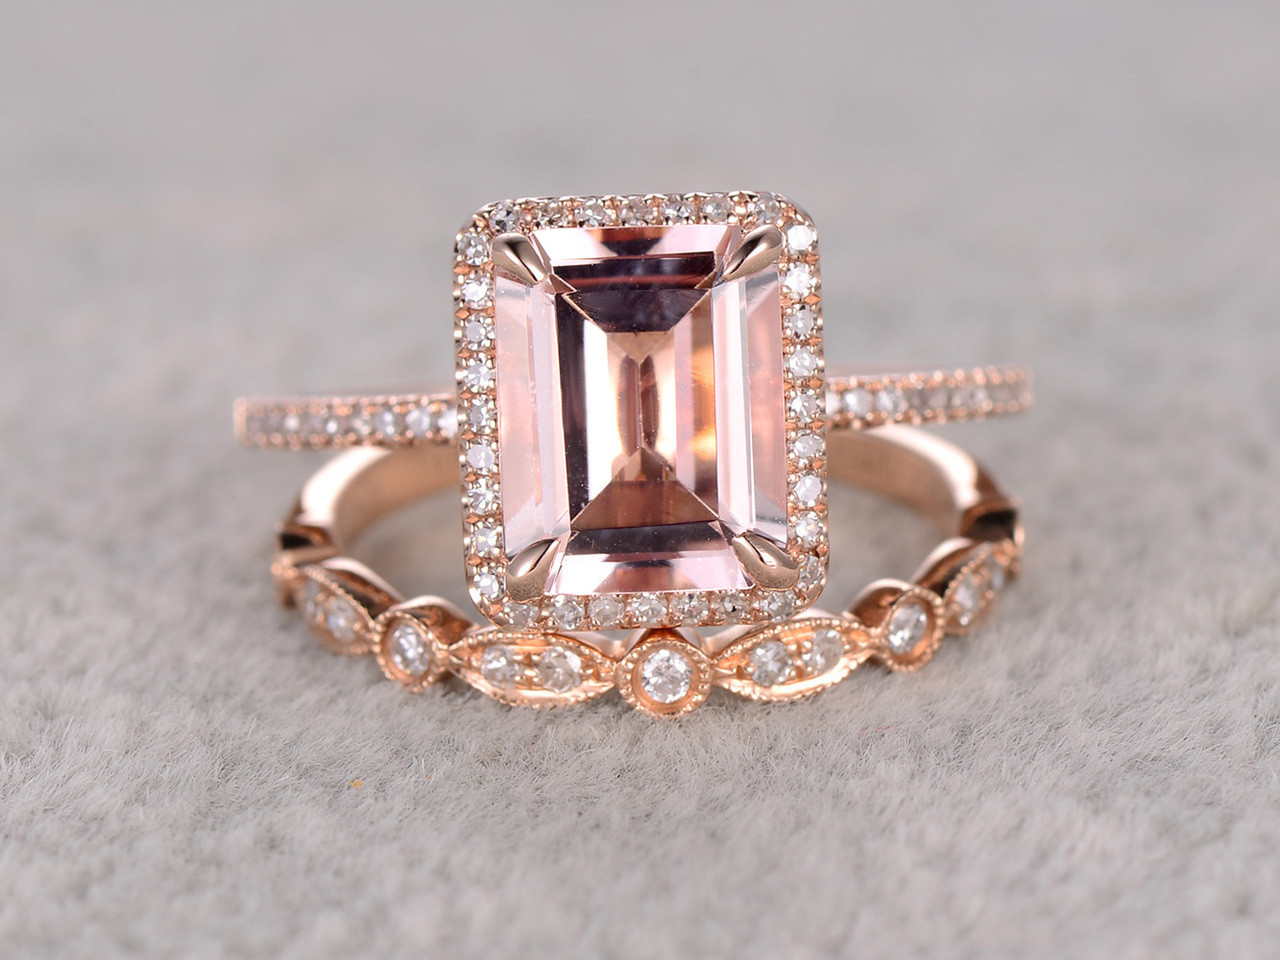 2 5 To 3 Carat Emerald Cut Morganite Engagement Ring Set Diamond